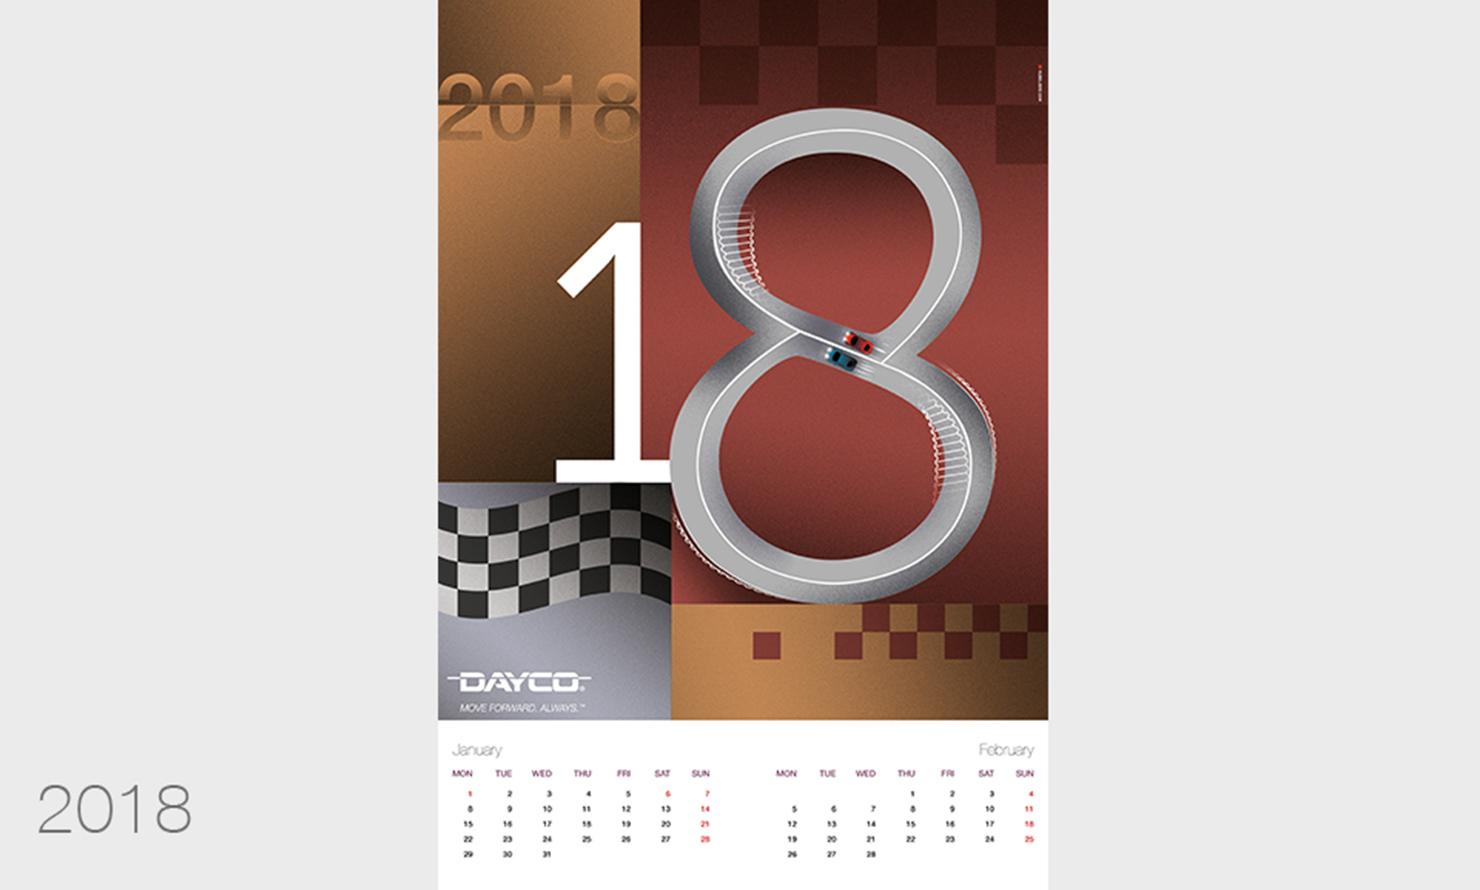 https://kubelibre.com/uploads/Slider-work-tutti-clienti/dayco-calendario-2018-1.jpg